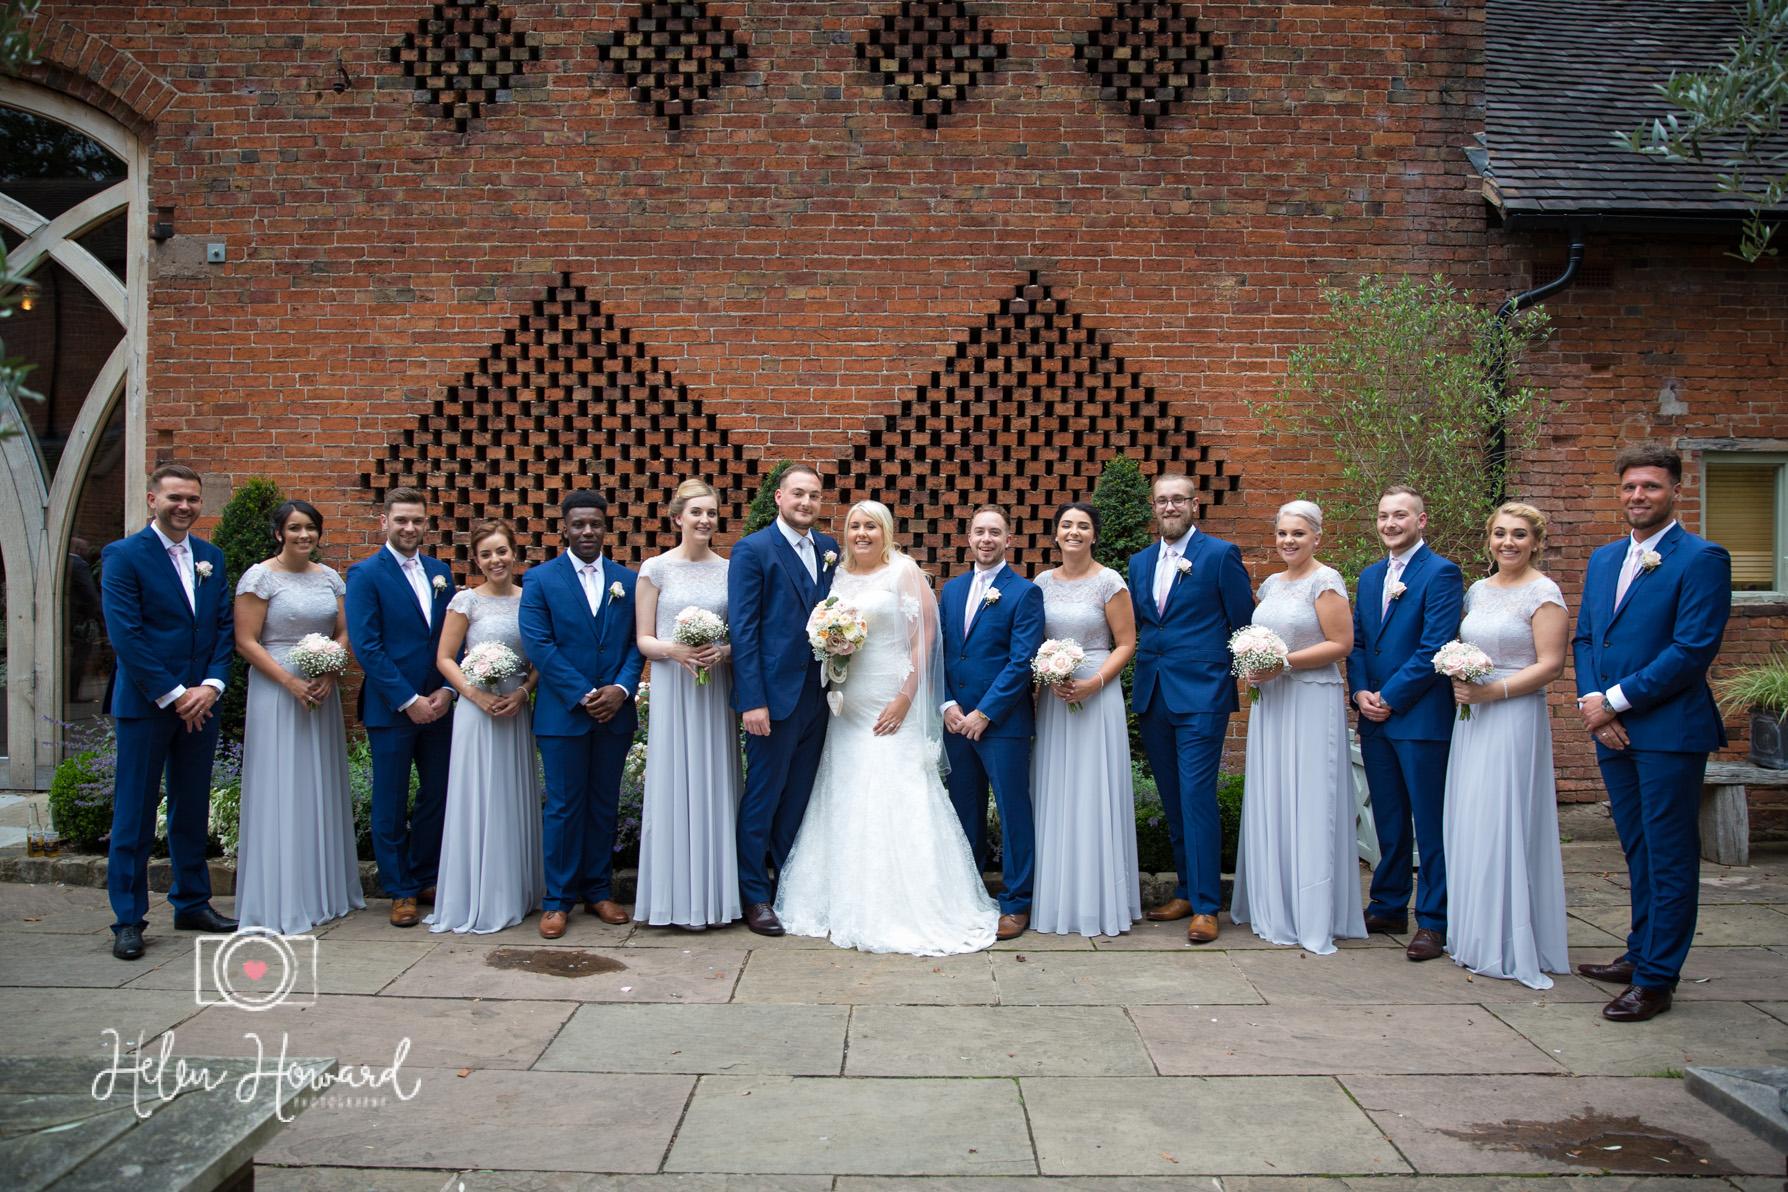 Shustoke Farm Barns Wedding Photography by Helen Howard-27.jpg